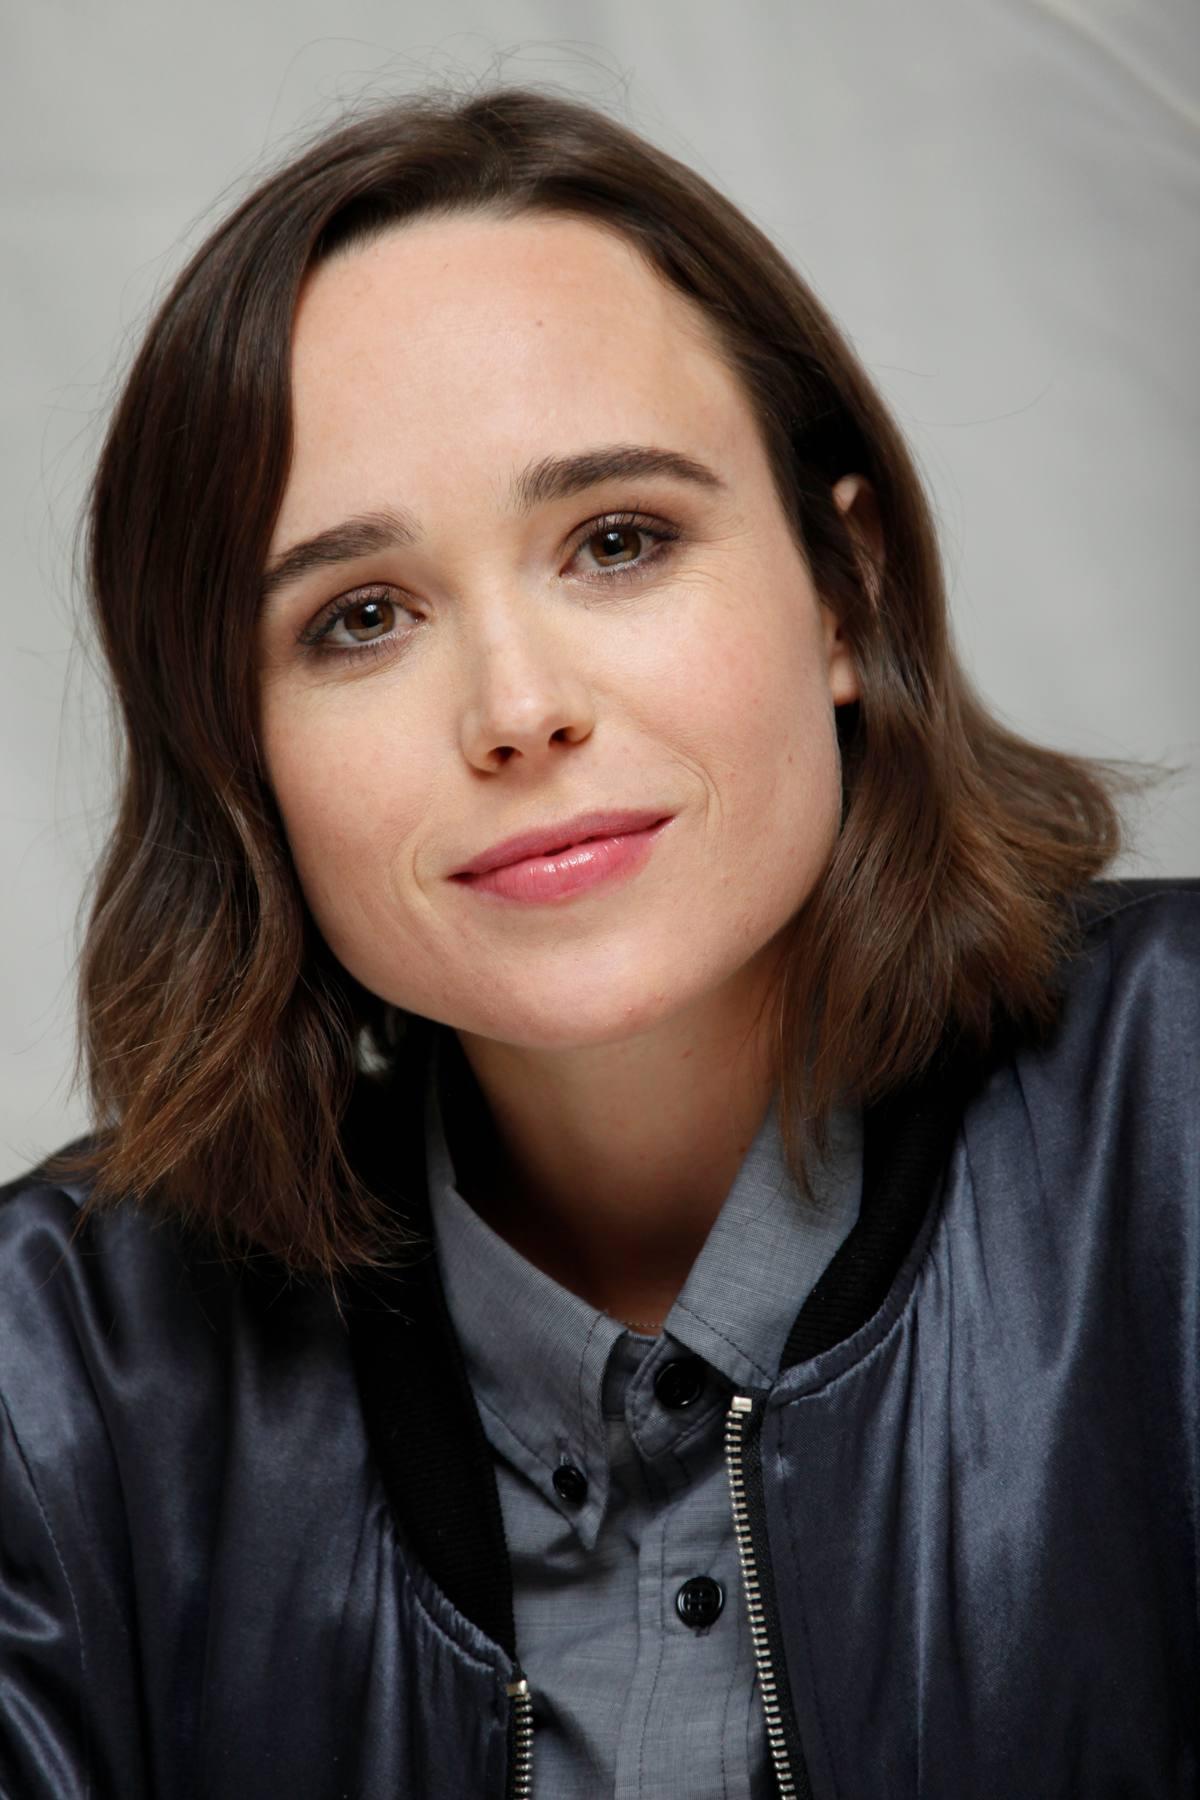 Ellen Page Freeheld Photocall – Celeb Donut Ellen Page